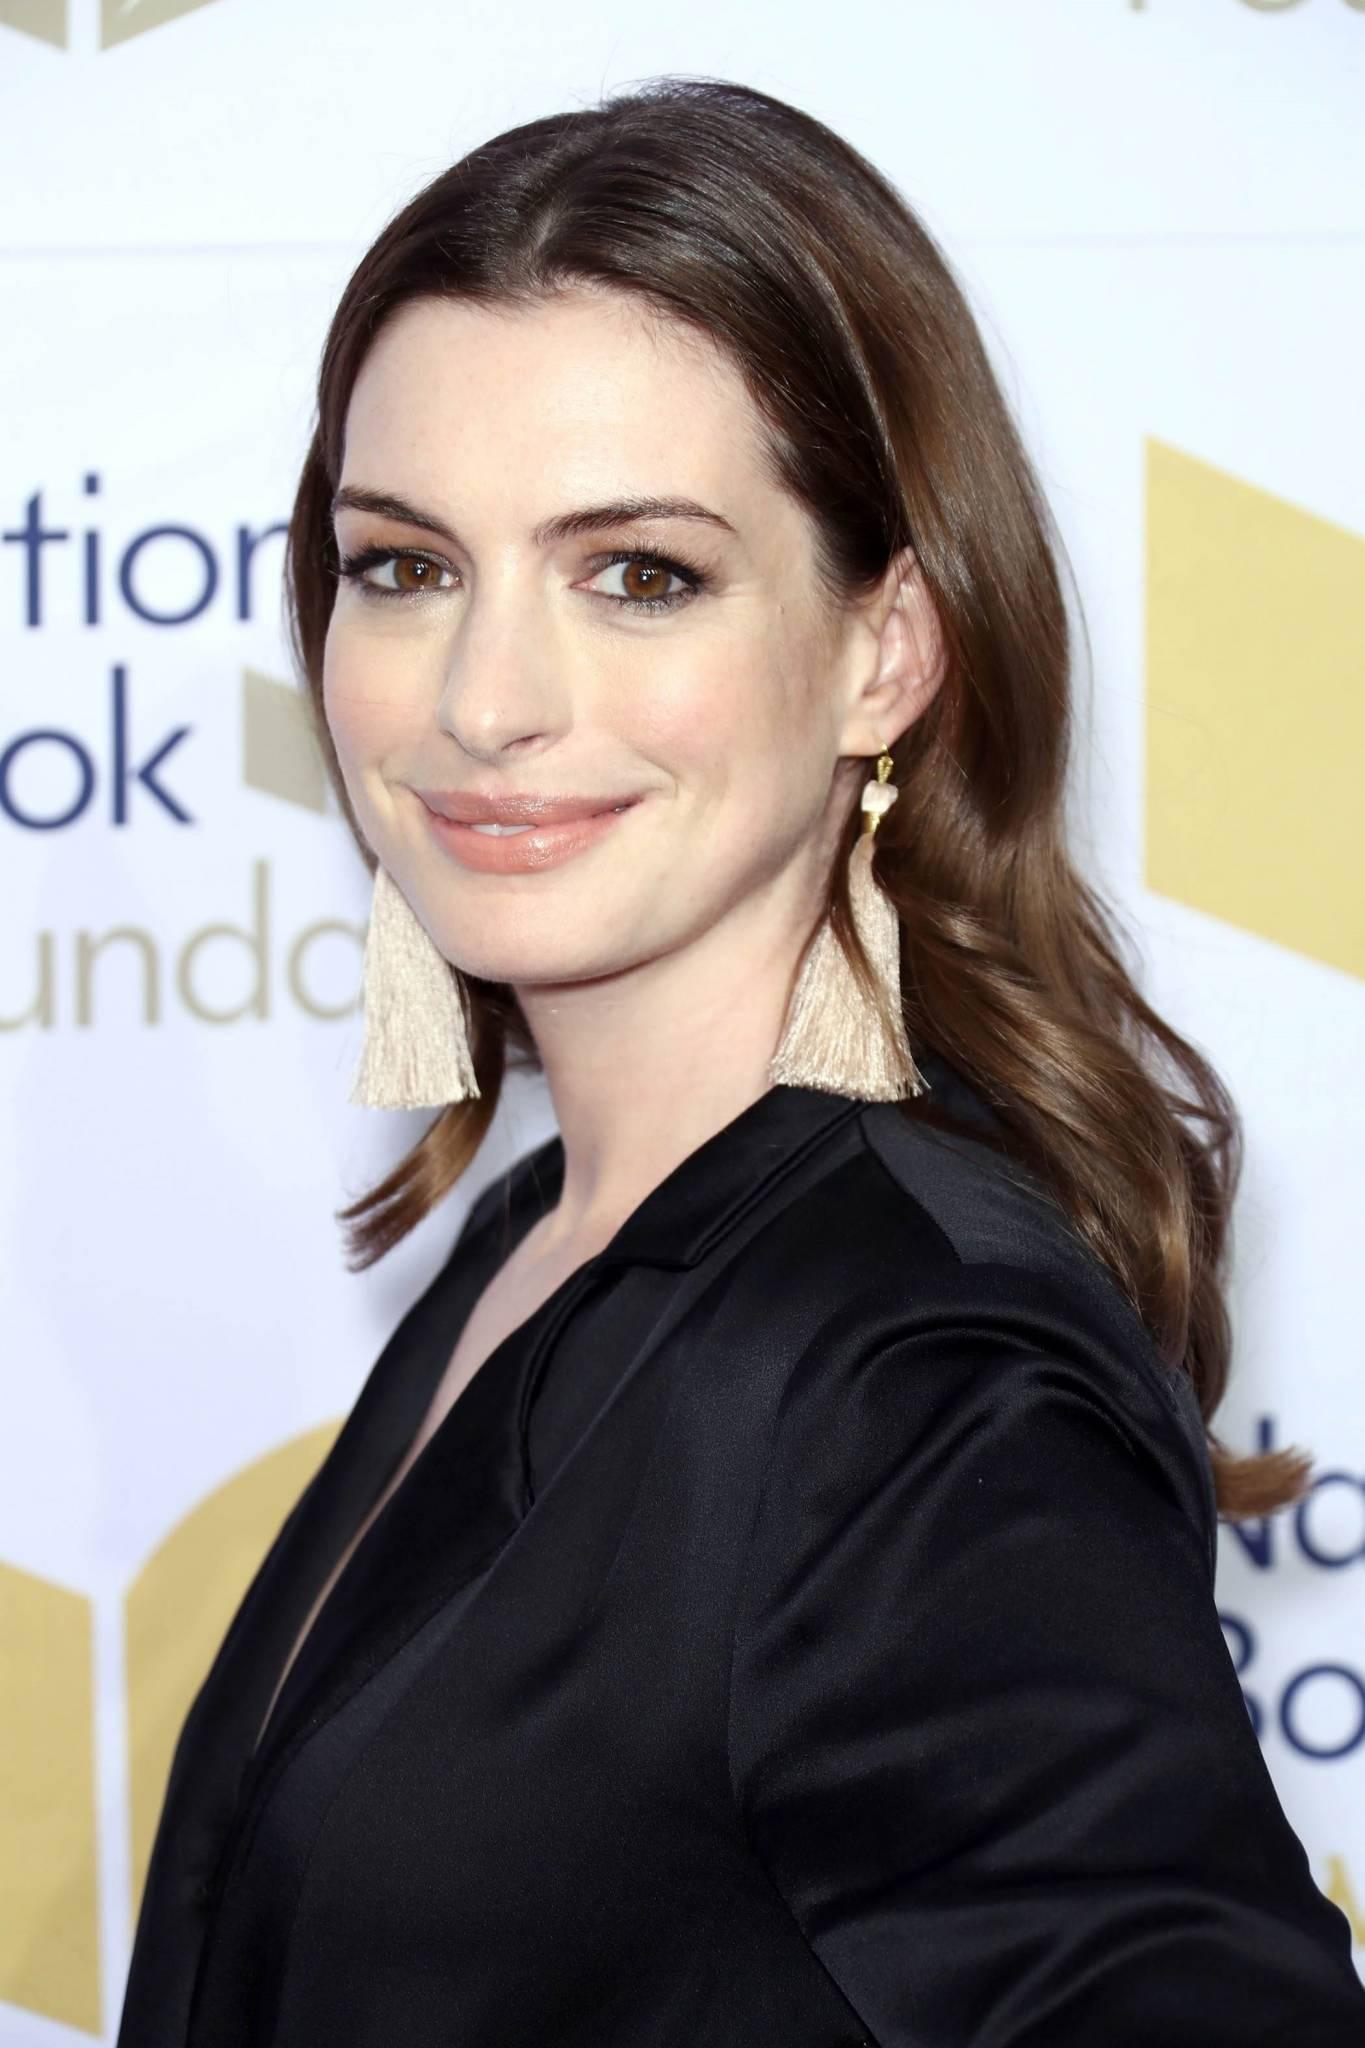 Anne Hathaway: To skomplikowane